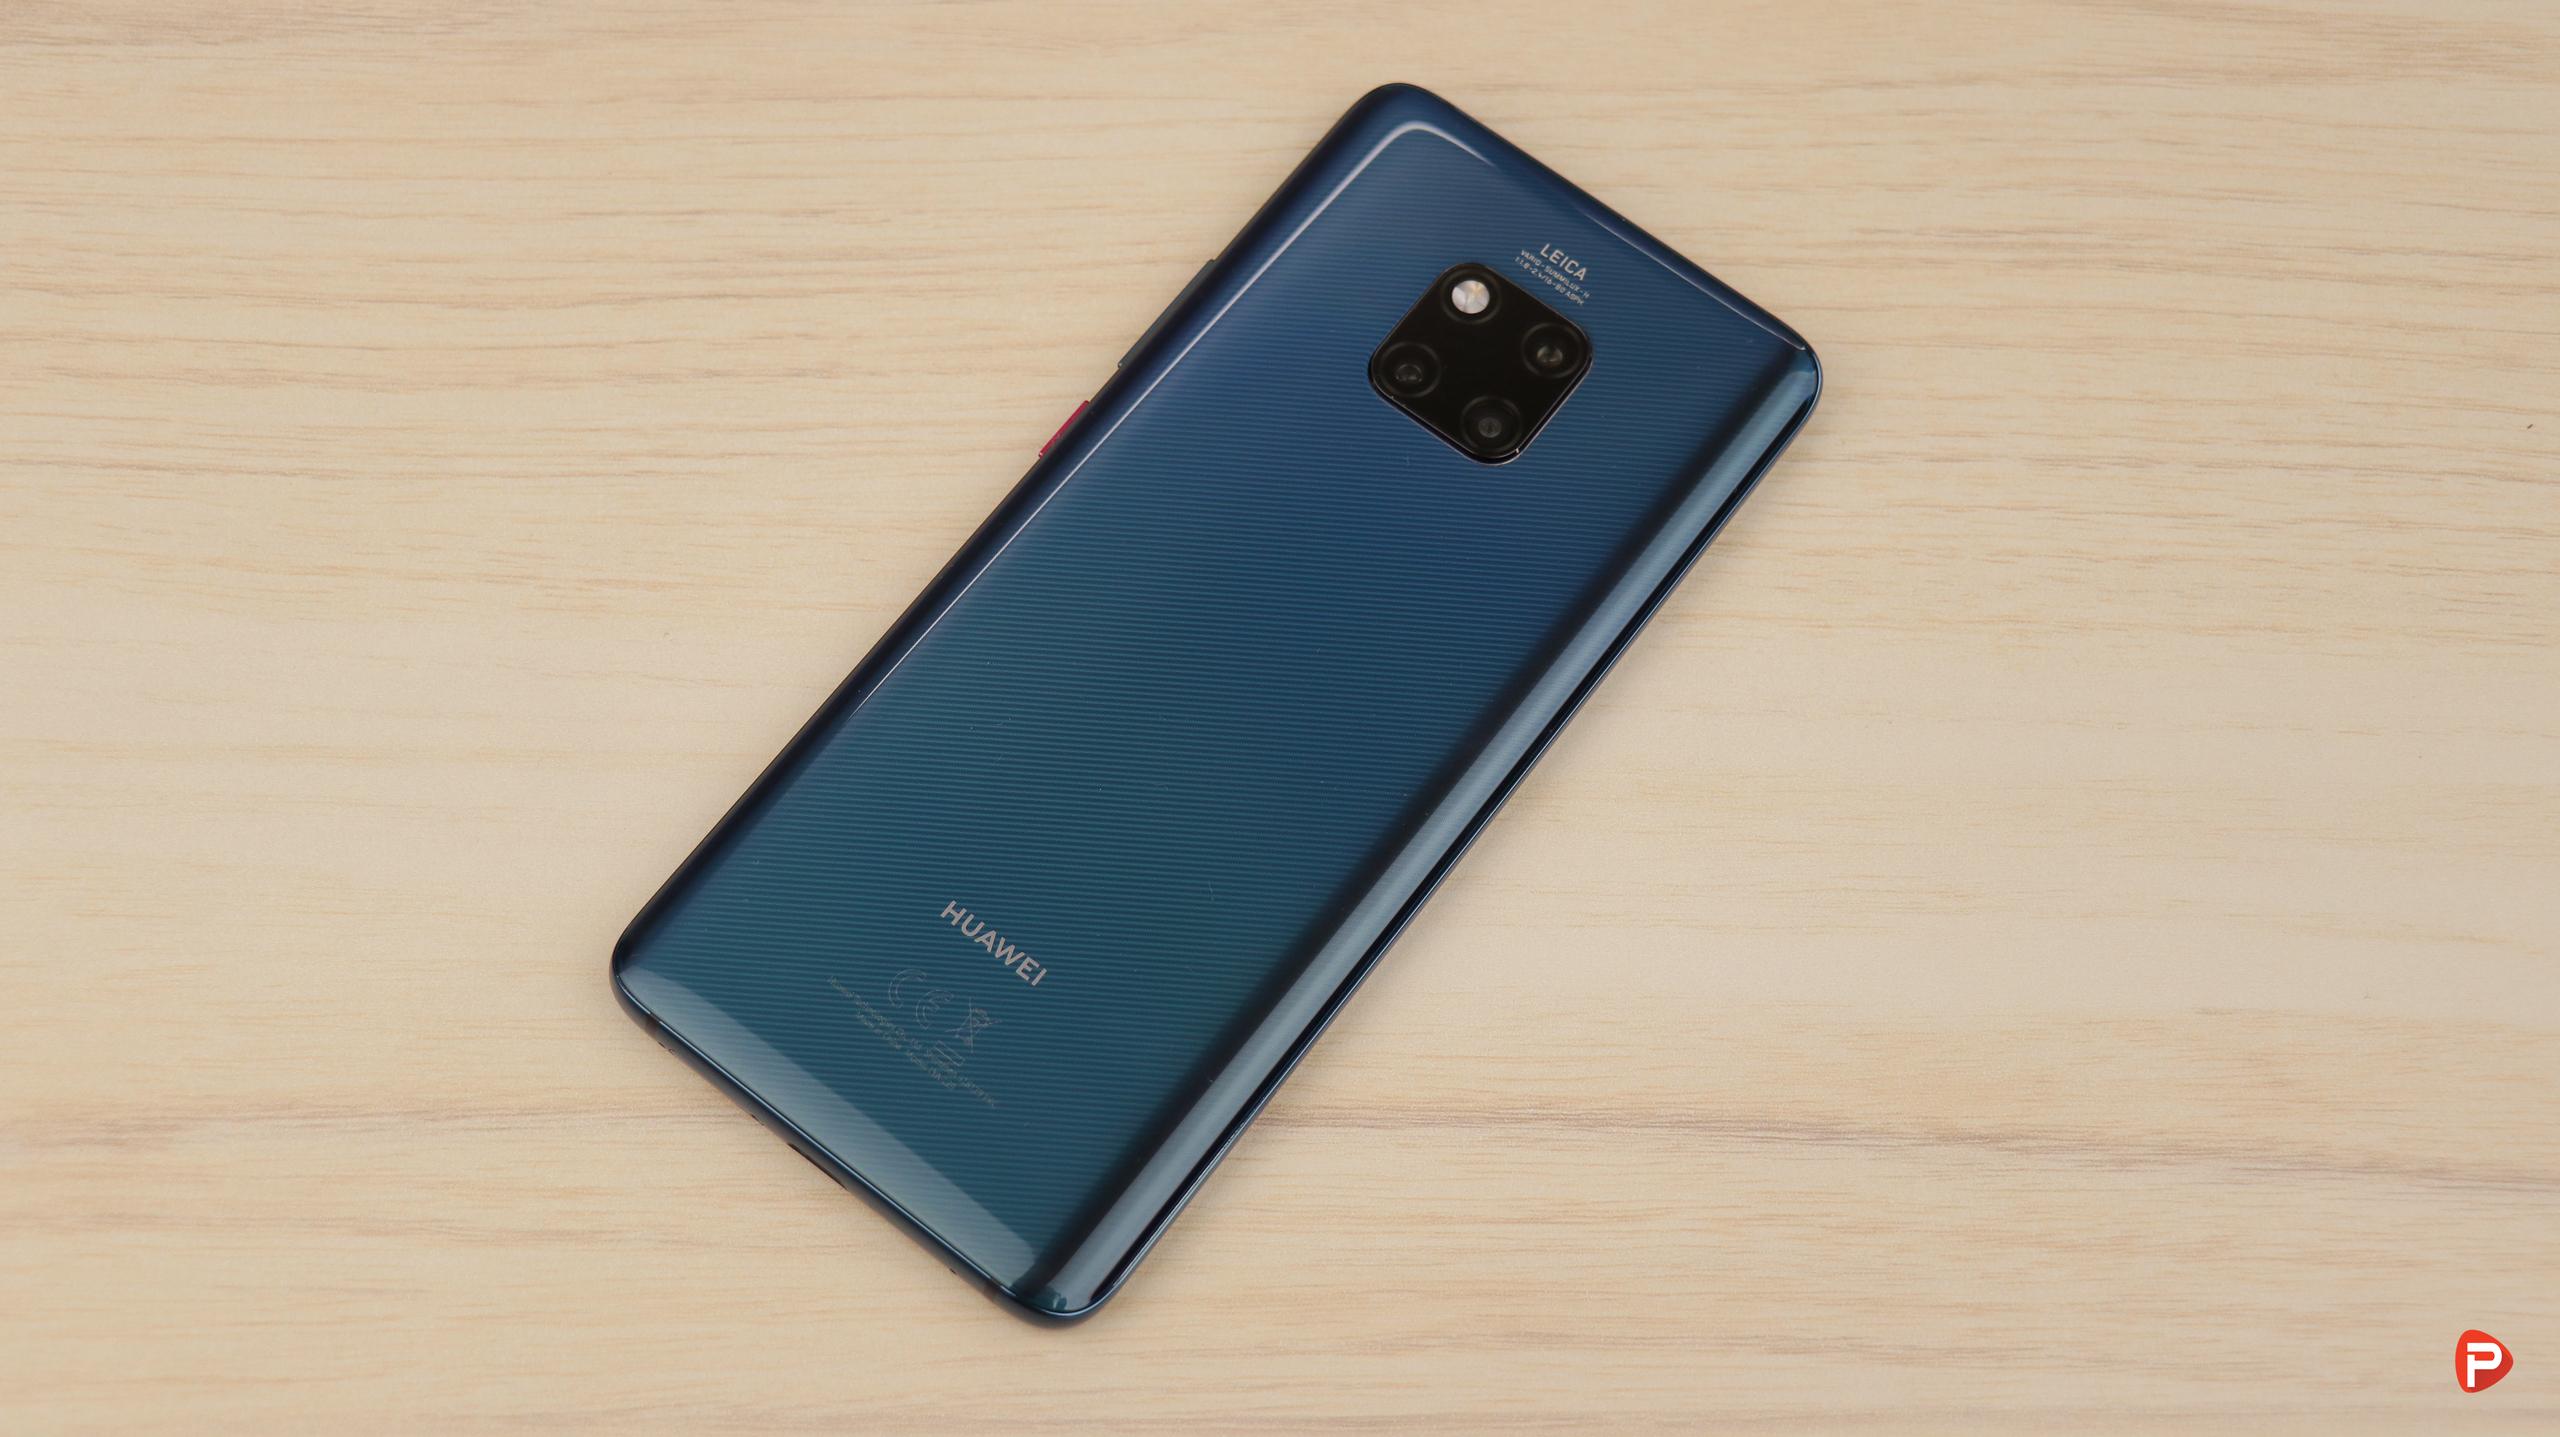 Huawei Mate 20 Pro in Nepal